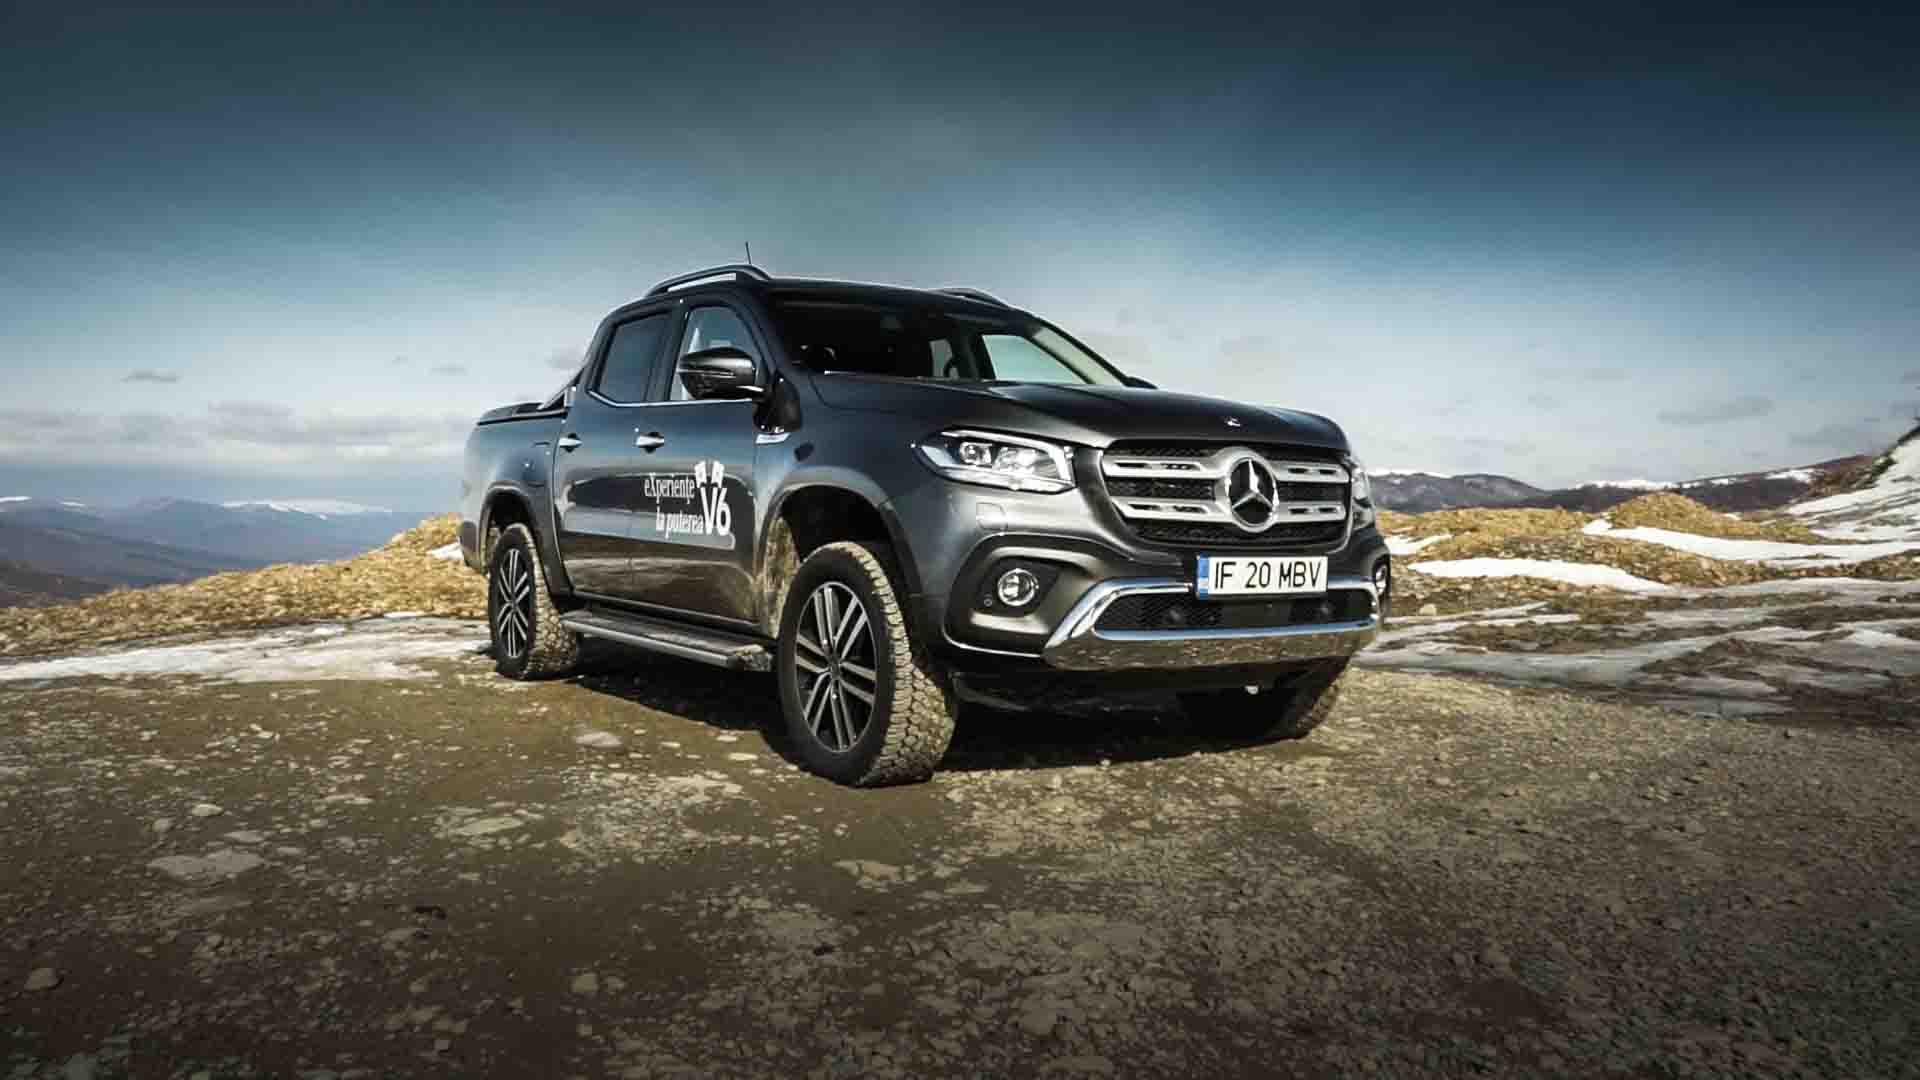 Test Drive Mercedes-Benz Clasa X V6 4MATIC 2019 [VIDEO]